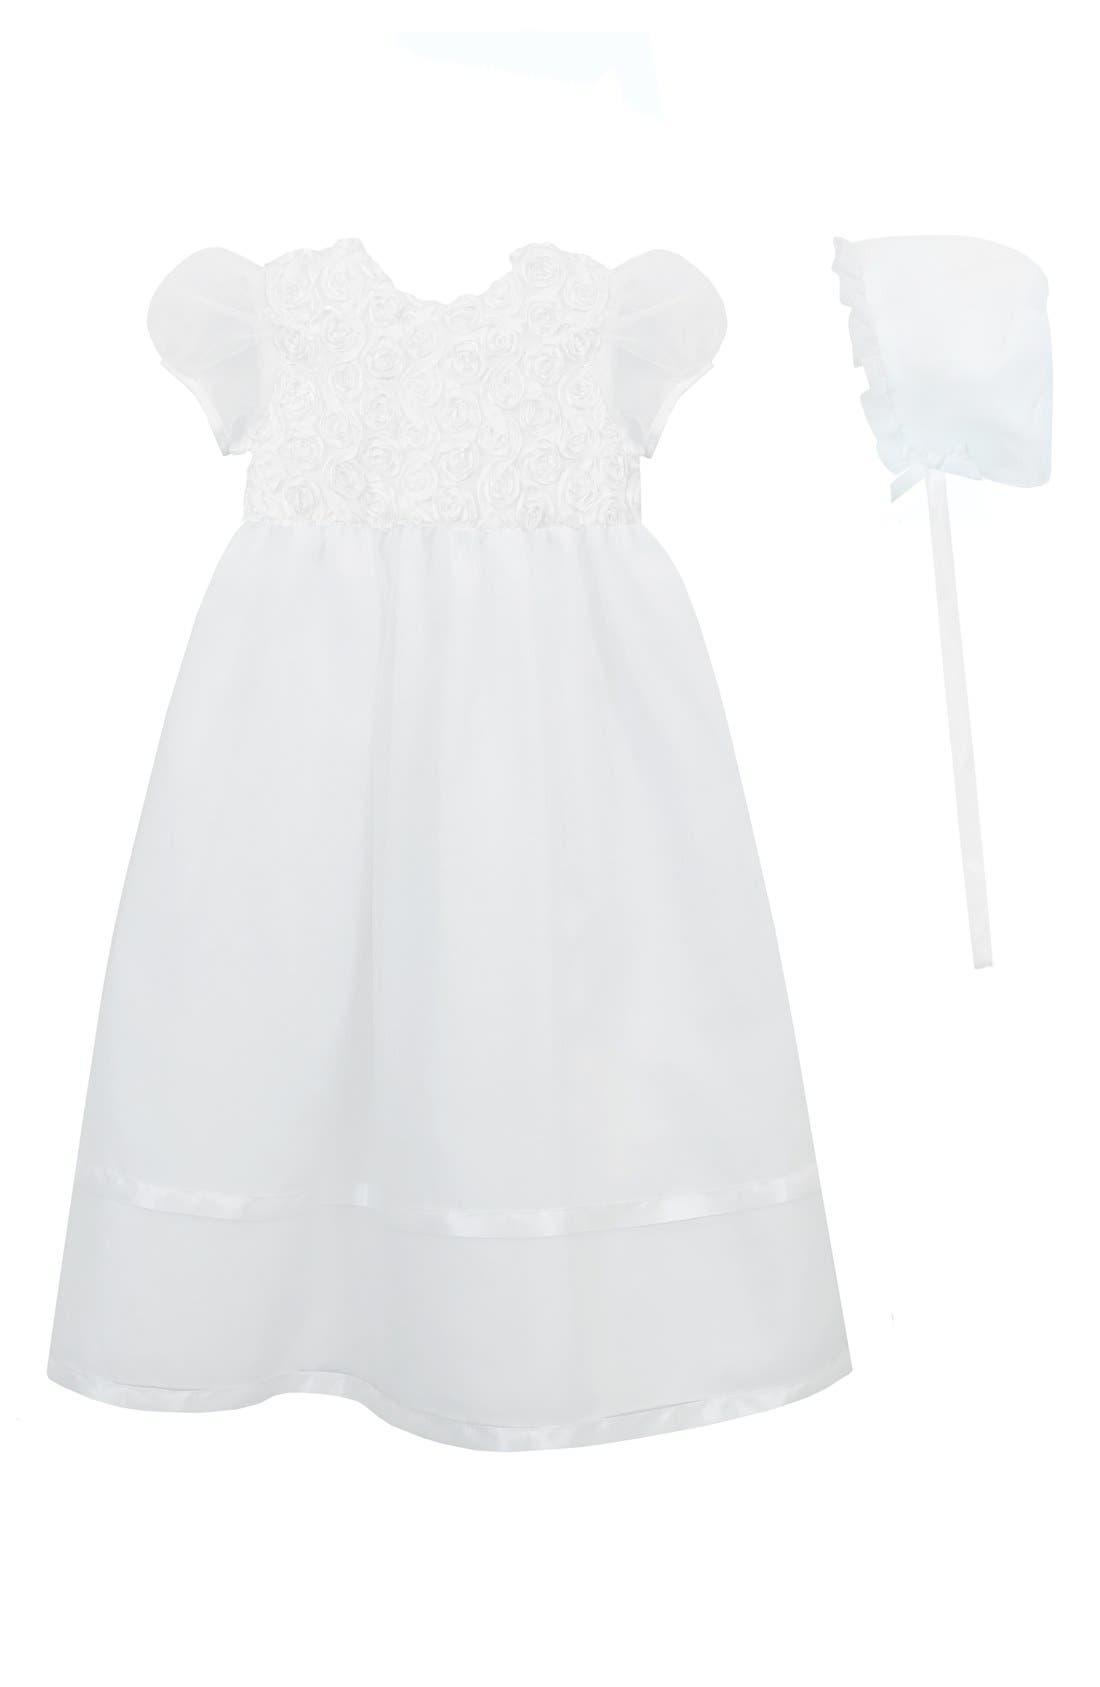 Main Image - C.I. Castro & Co. Christening Gown & Bonnet (Baby)